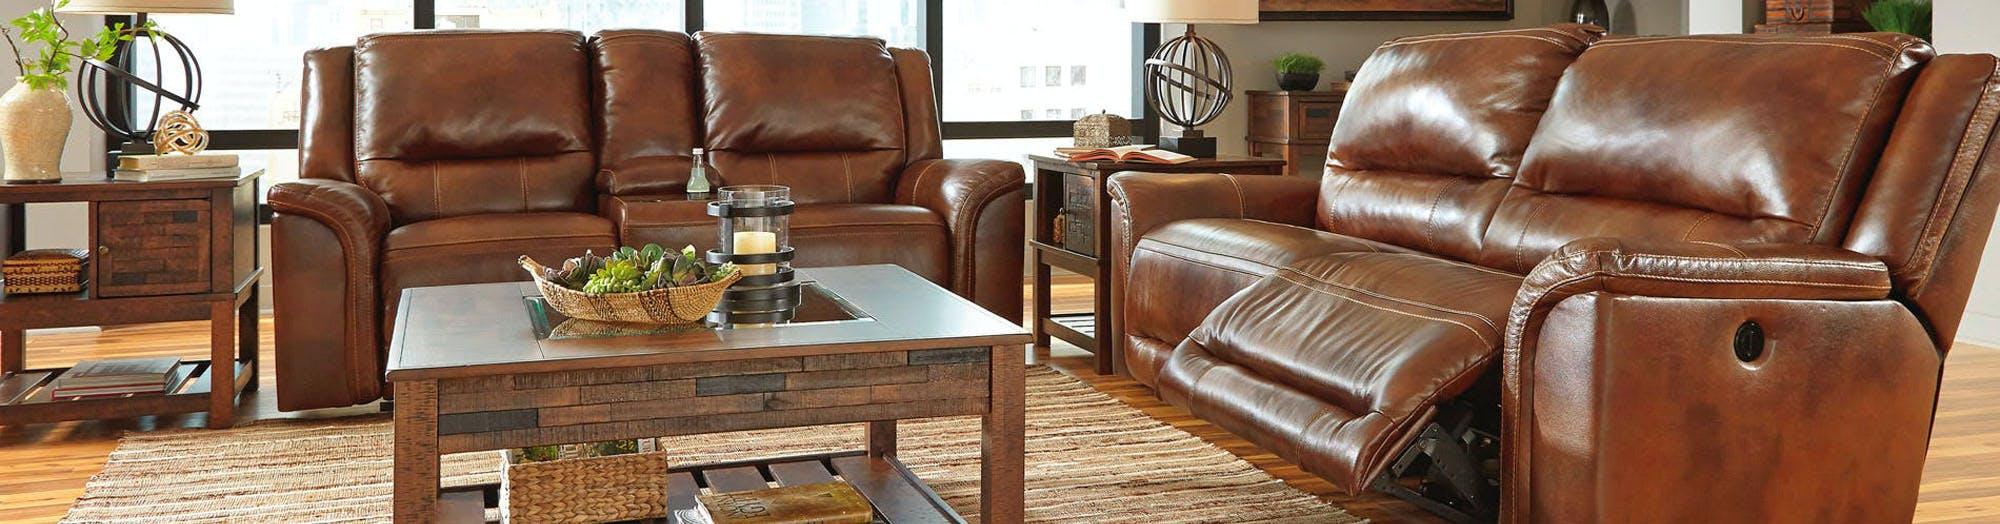 Shop For Living Room Sets In Cincinnati And Dayton OH Part 89